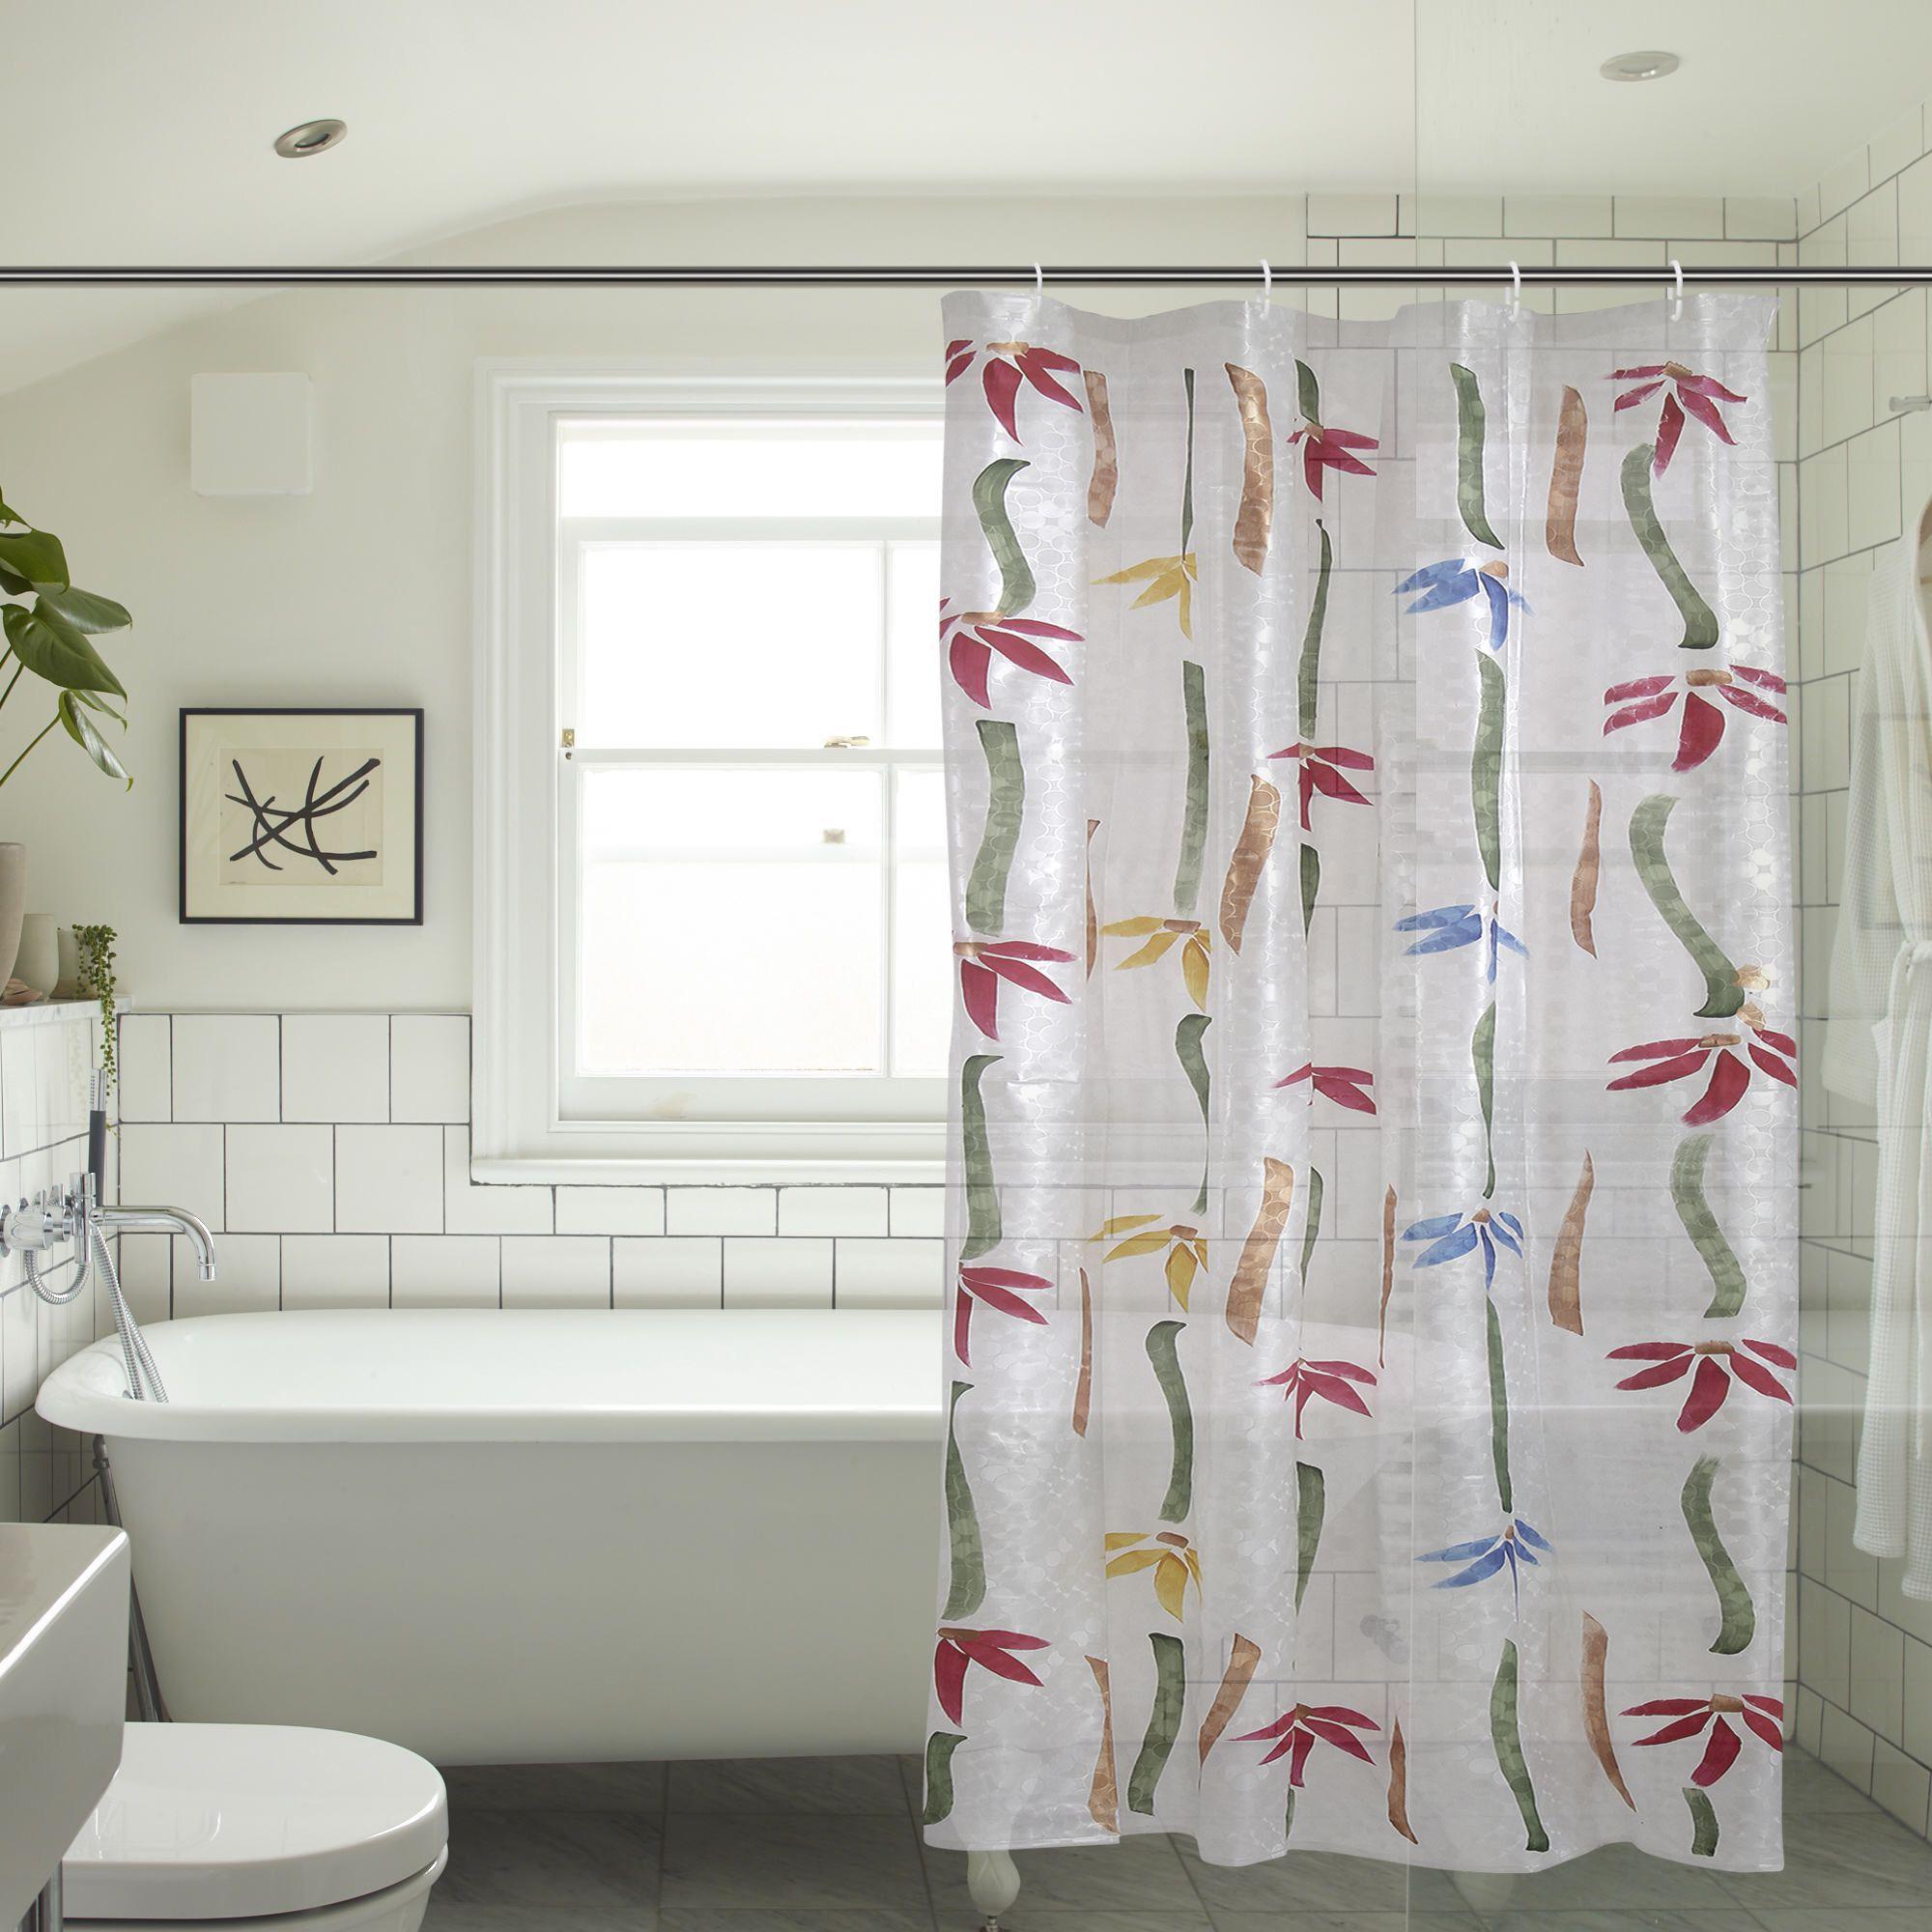 Khushi Creation Set of 2 Door Semi-Transparent Rod Pocket PVC Curtains Multi Color